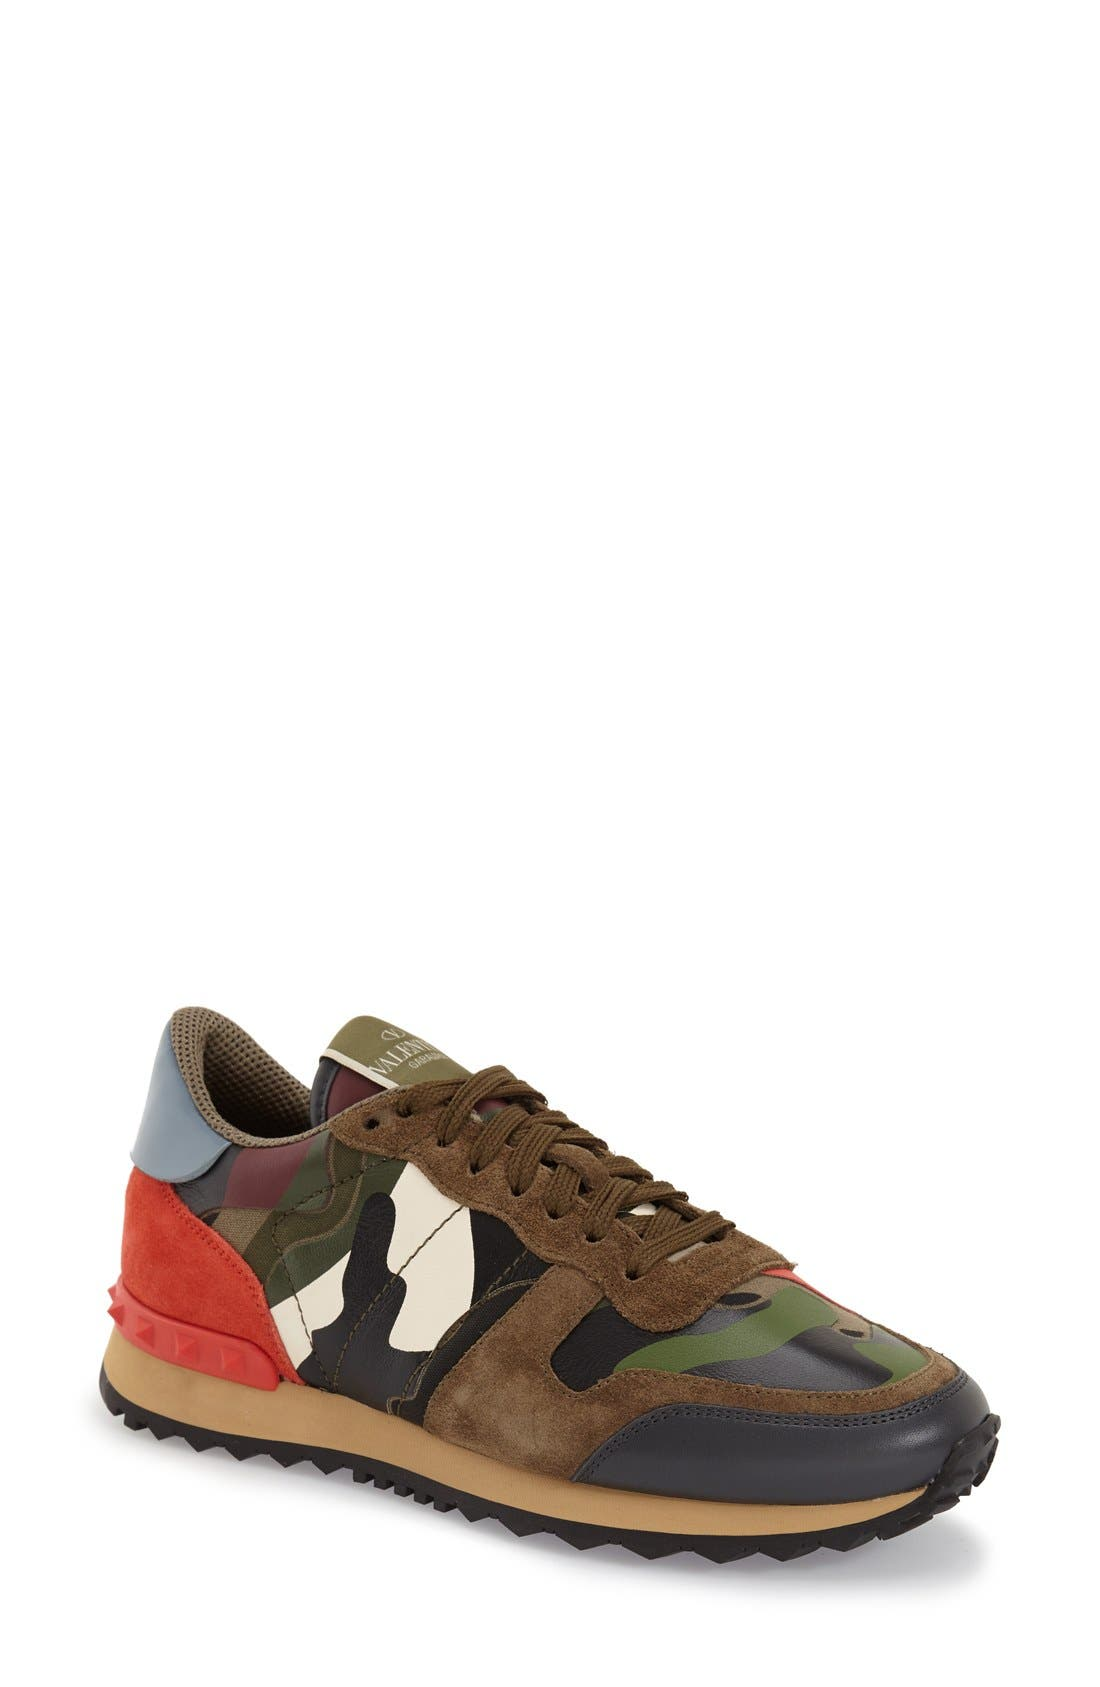 Alternate Image 1 Selected - Valentino Rockstud Camo Sneaker (Women)